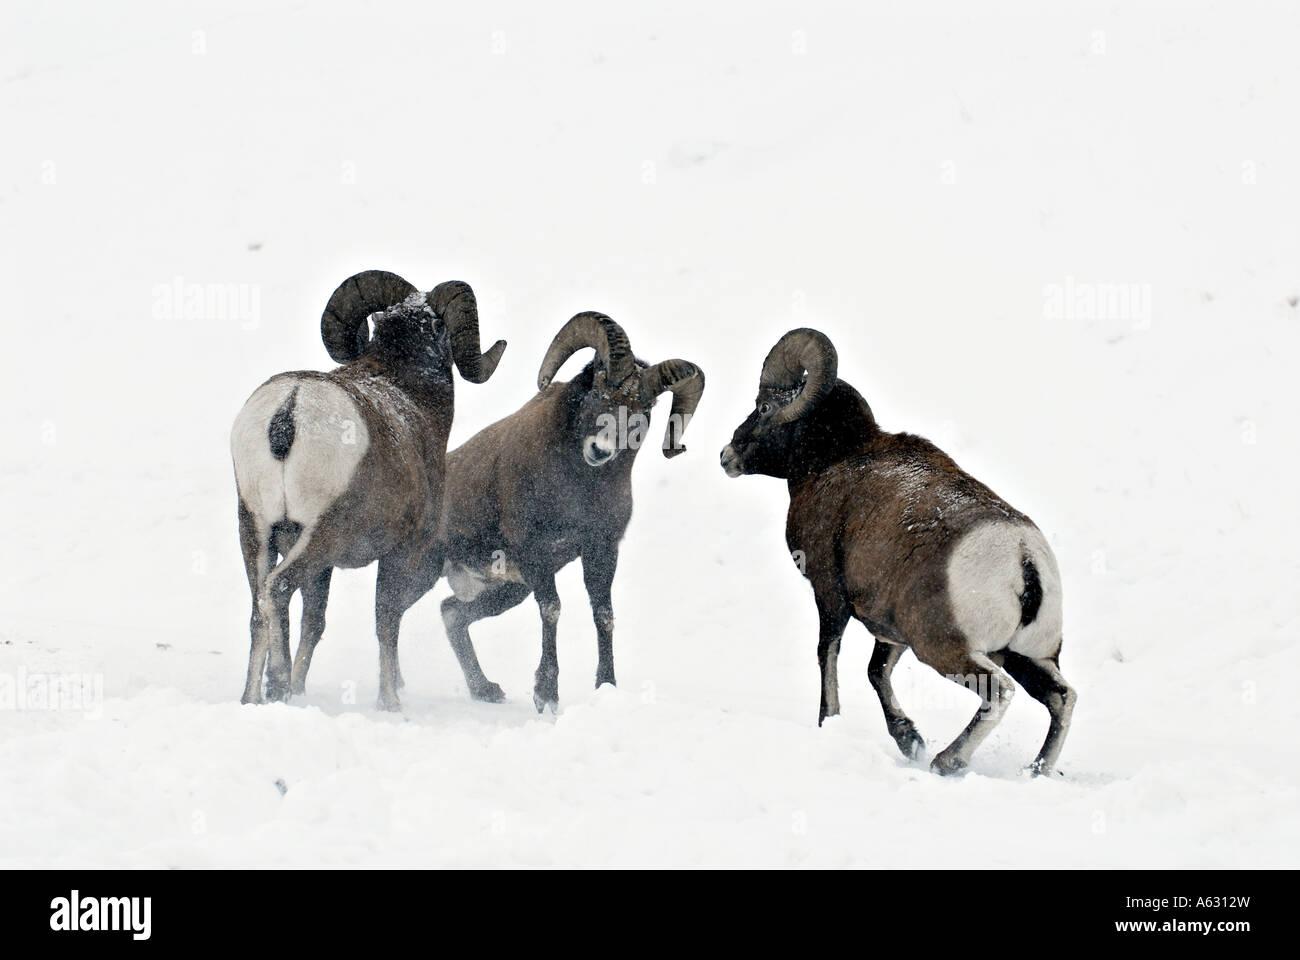 Bighorn Sheep Butting Heads